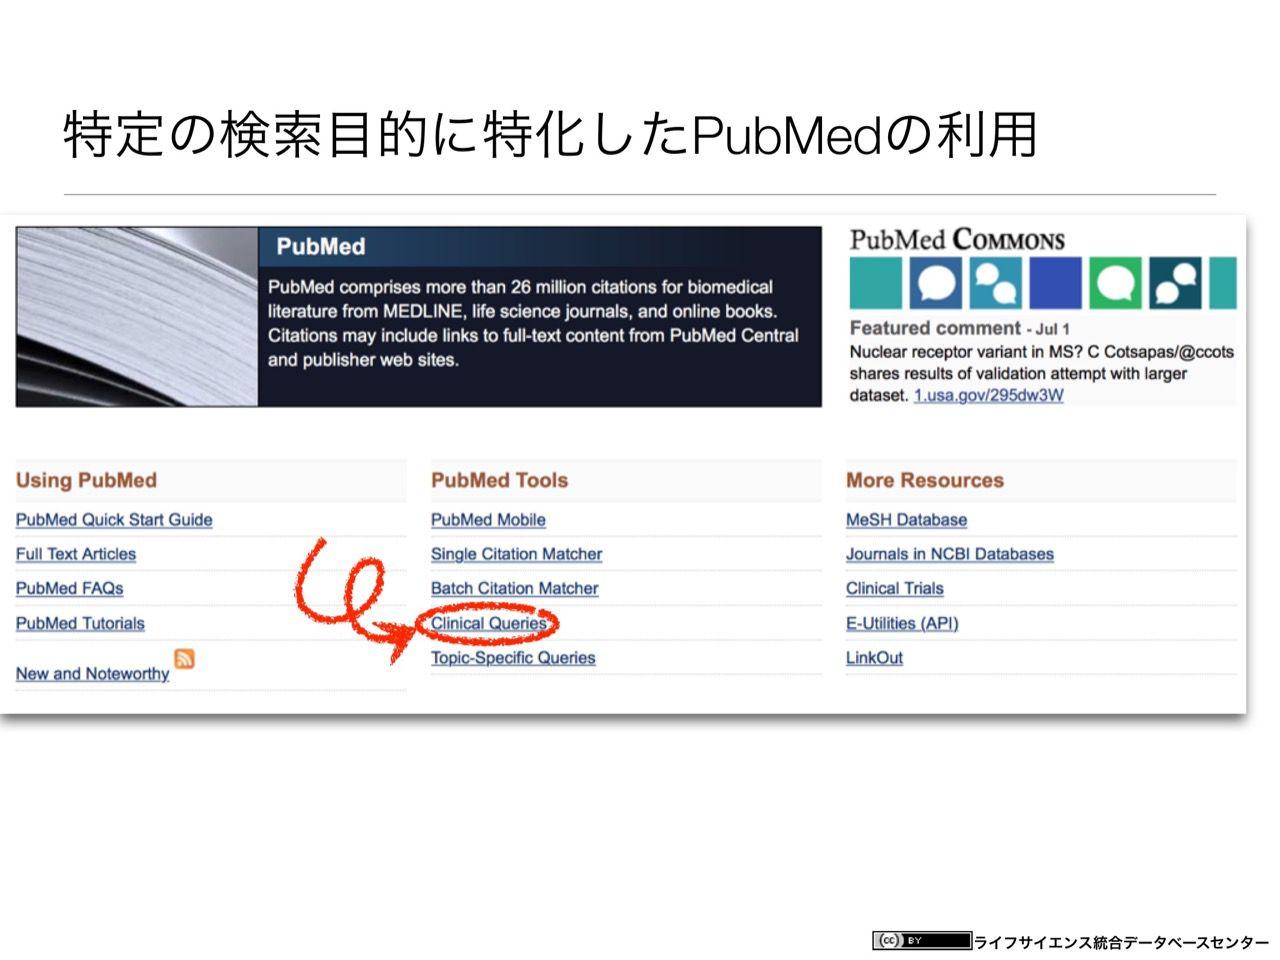 images/AJACS60_yamamoto_023.jpg